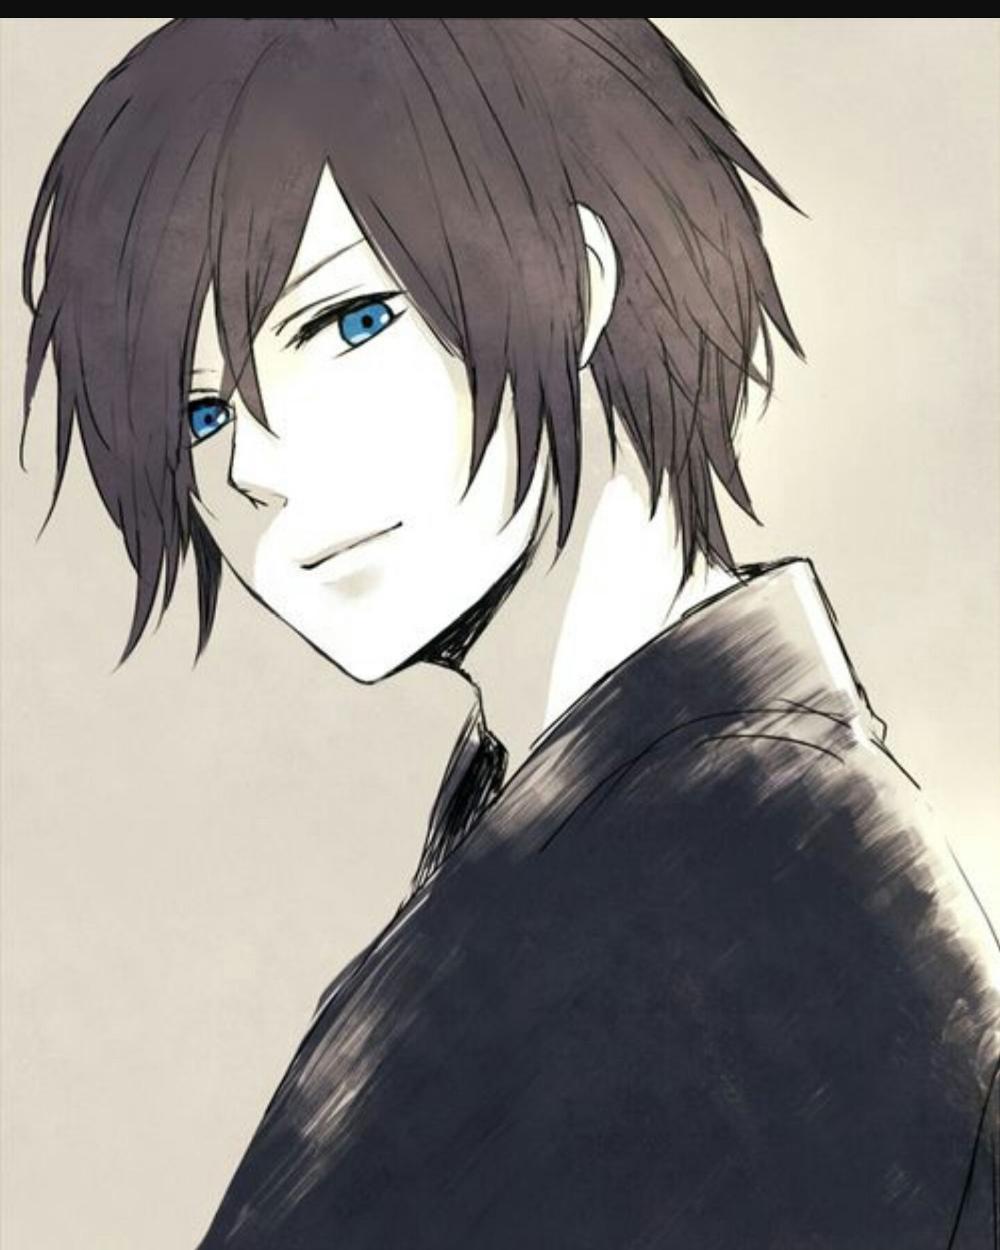 anime boy with brown hair and blue eyes - Google Search | Anime guy blue  hair, Anime guys with glasses, Anime